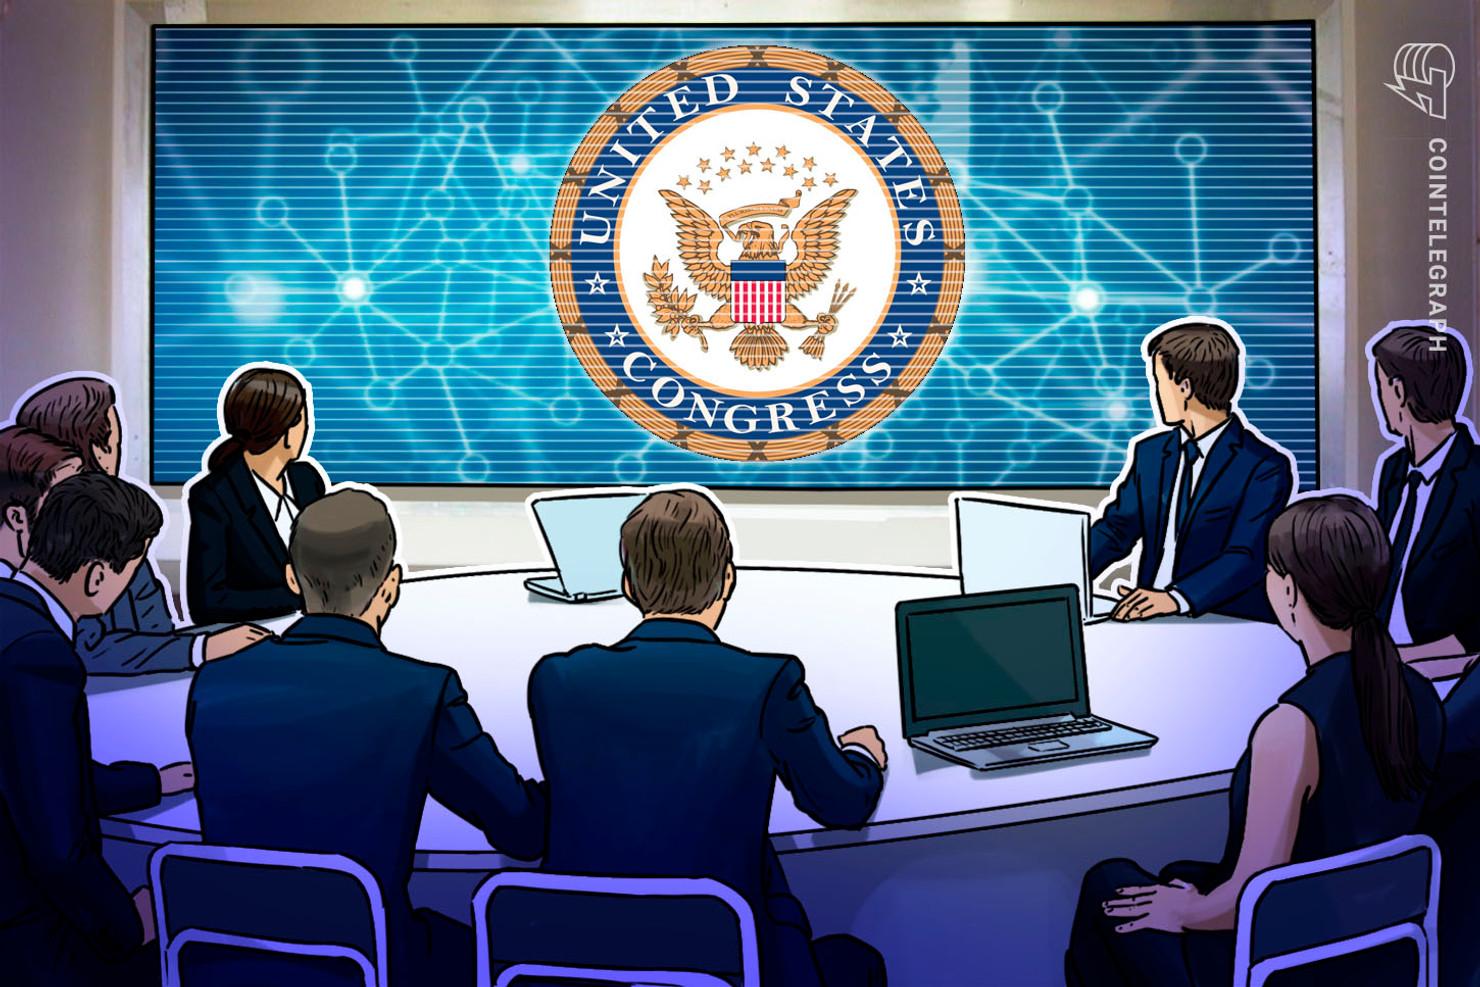 Crypto Taxes a 'Nightmare' — Congress Hears the Latest on<a href='https://phobitcoin.com/bitcoin-hoat-dong-ra-sao-hieu-ro-ve-blockchain-va-bitcoin'><b class='text-danger'> Blockchain </b></a>for Small Business